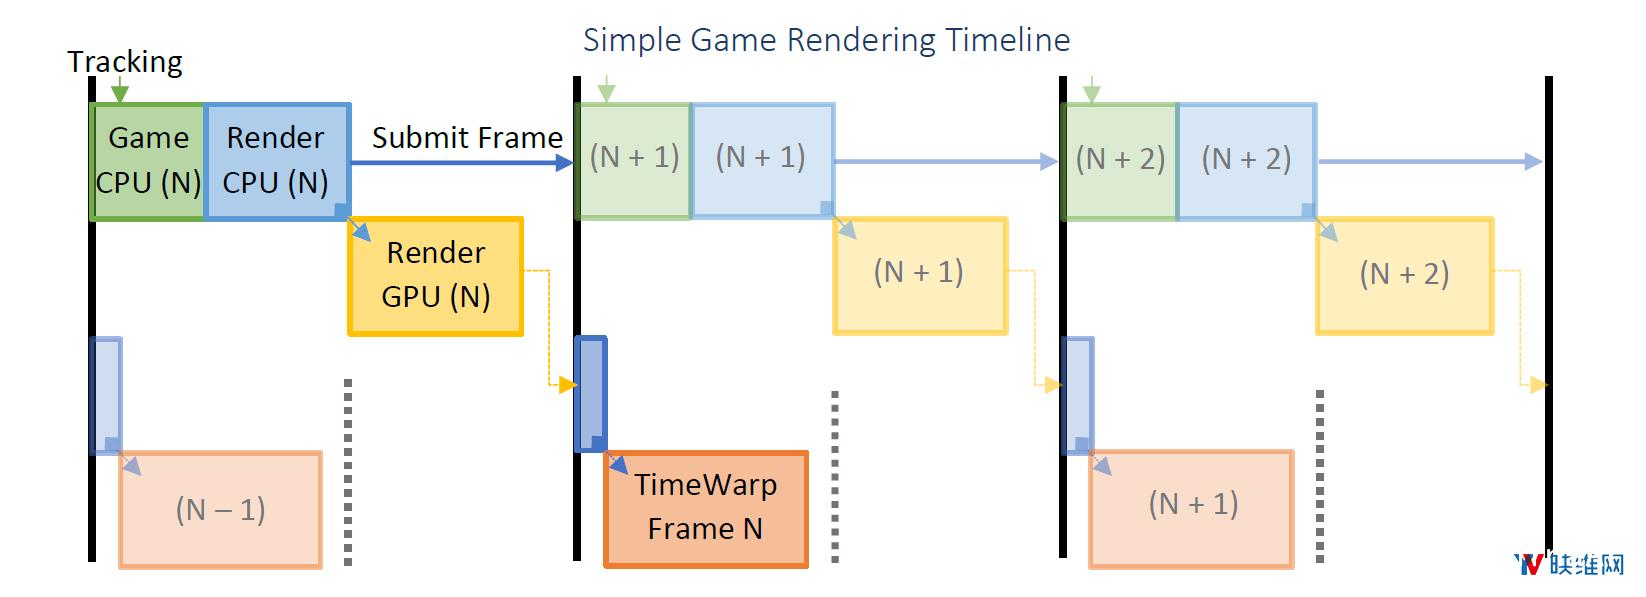 Oculus详述『延迟』问题及对应『帧渲染』解决方案 资源教程 第2张